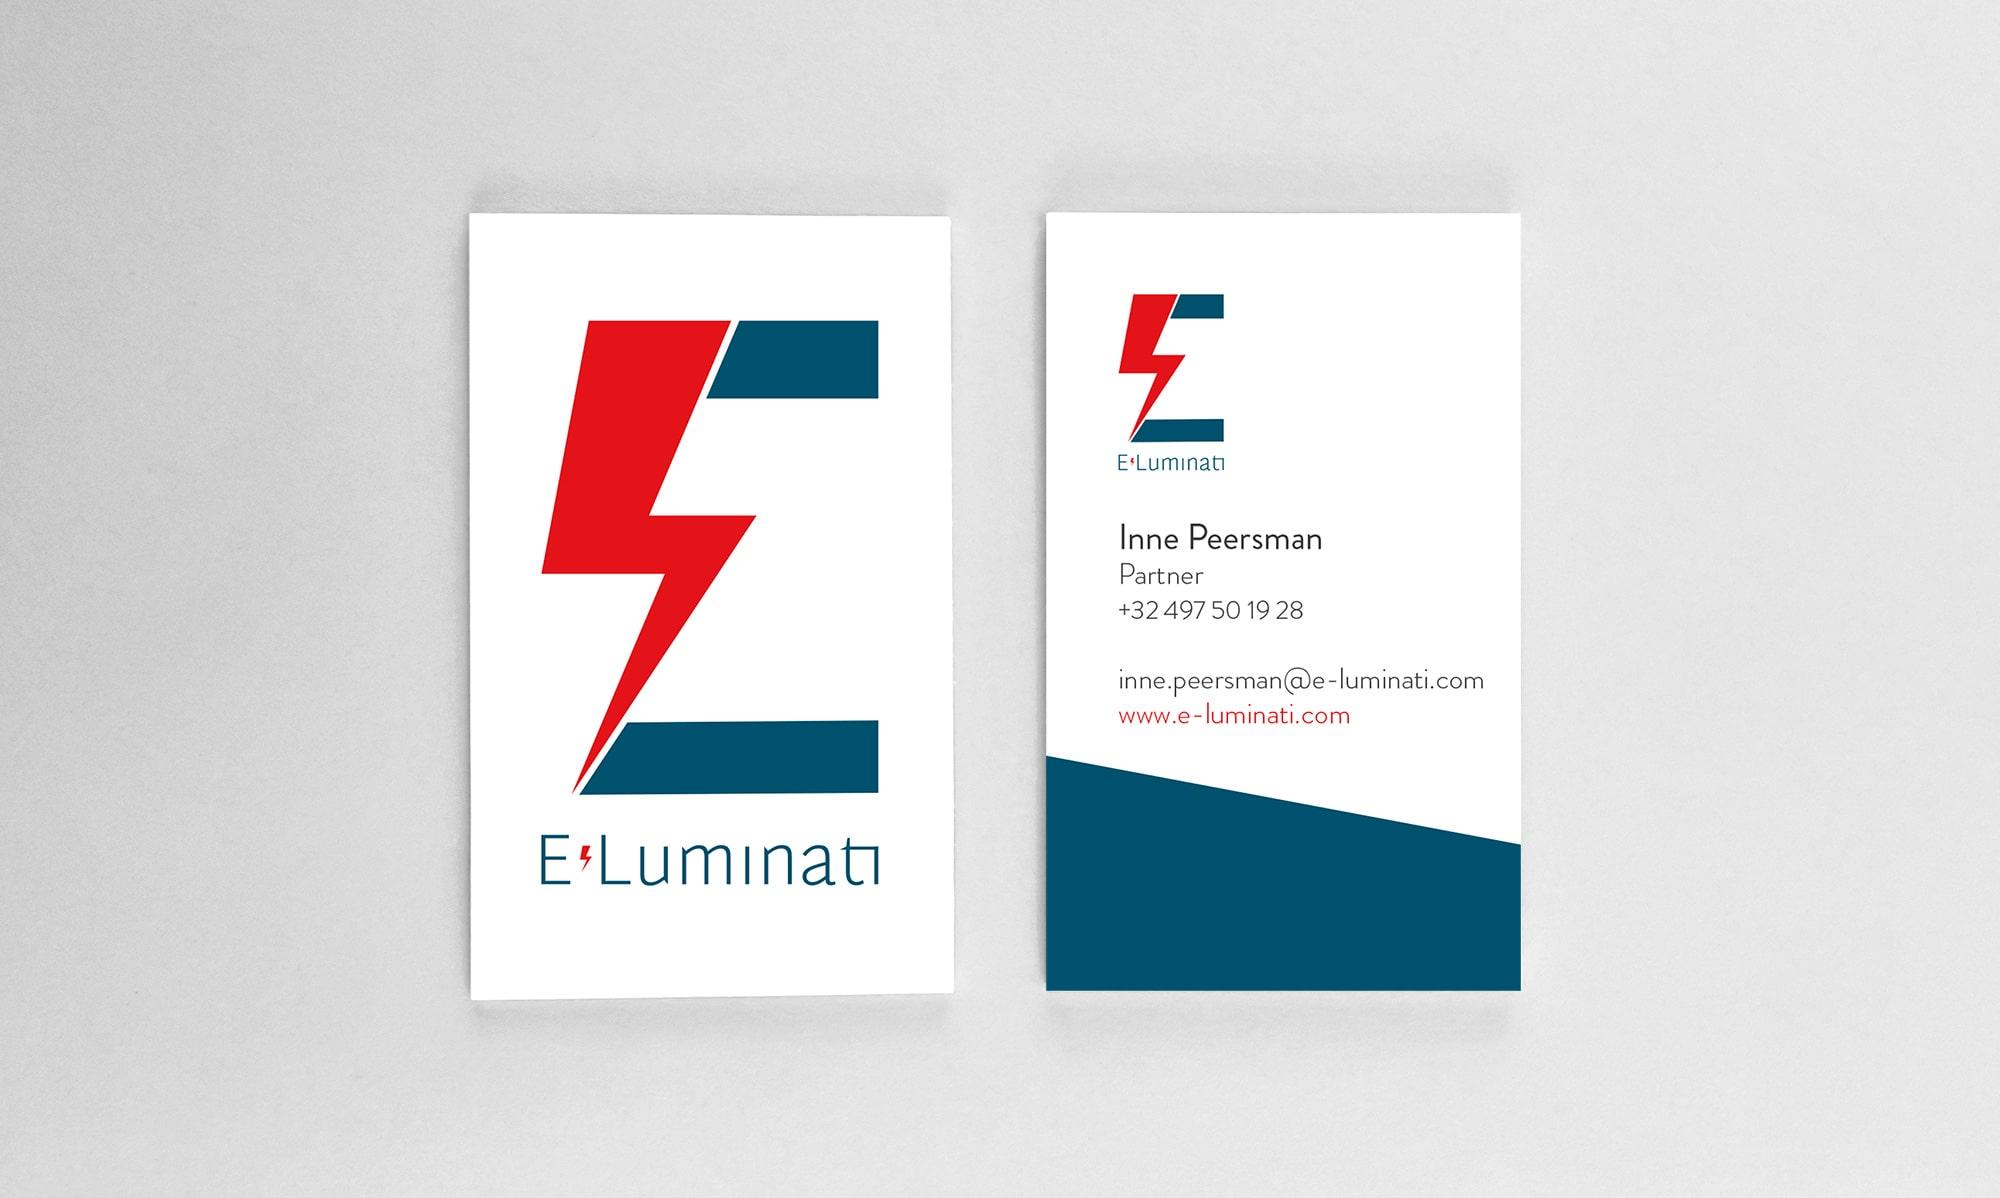 E-luminati huisstijl